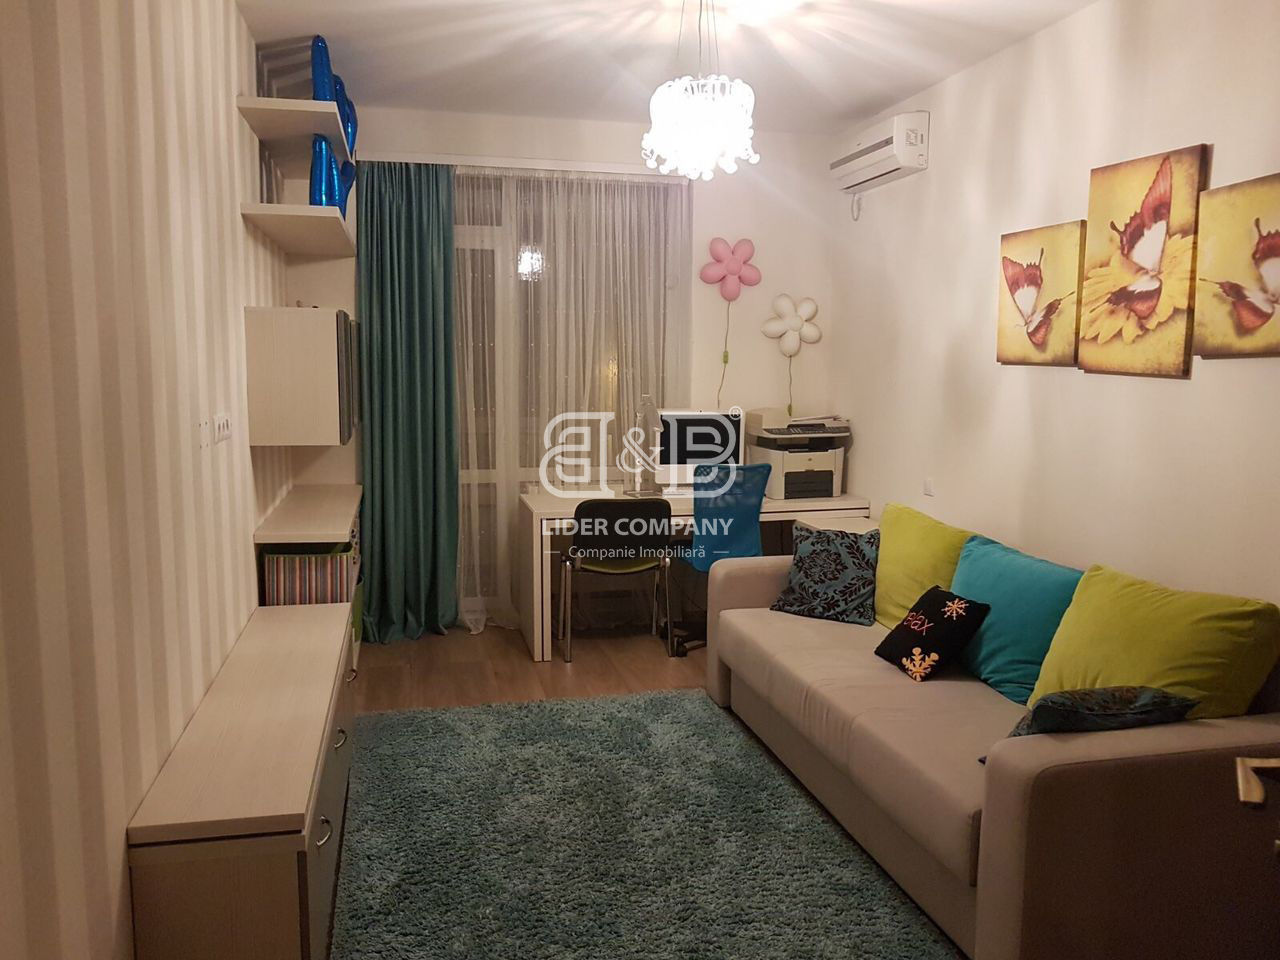 Spre chirie, str. Constantin Vârnav ! Telecentru ! apartament cu 2 camere separate 85 m2